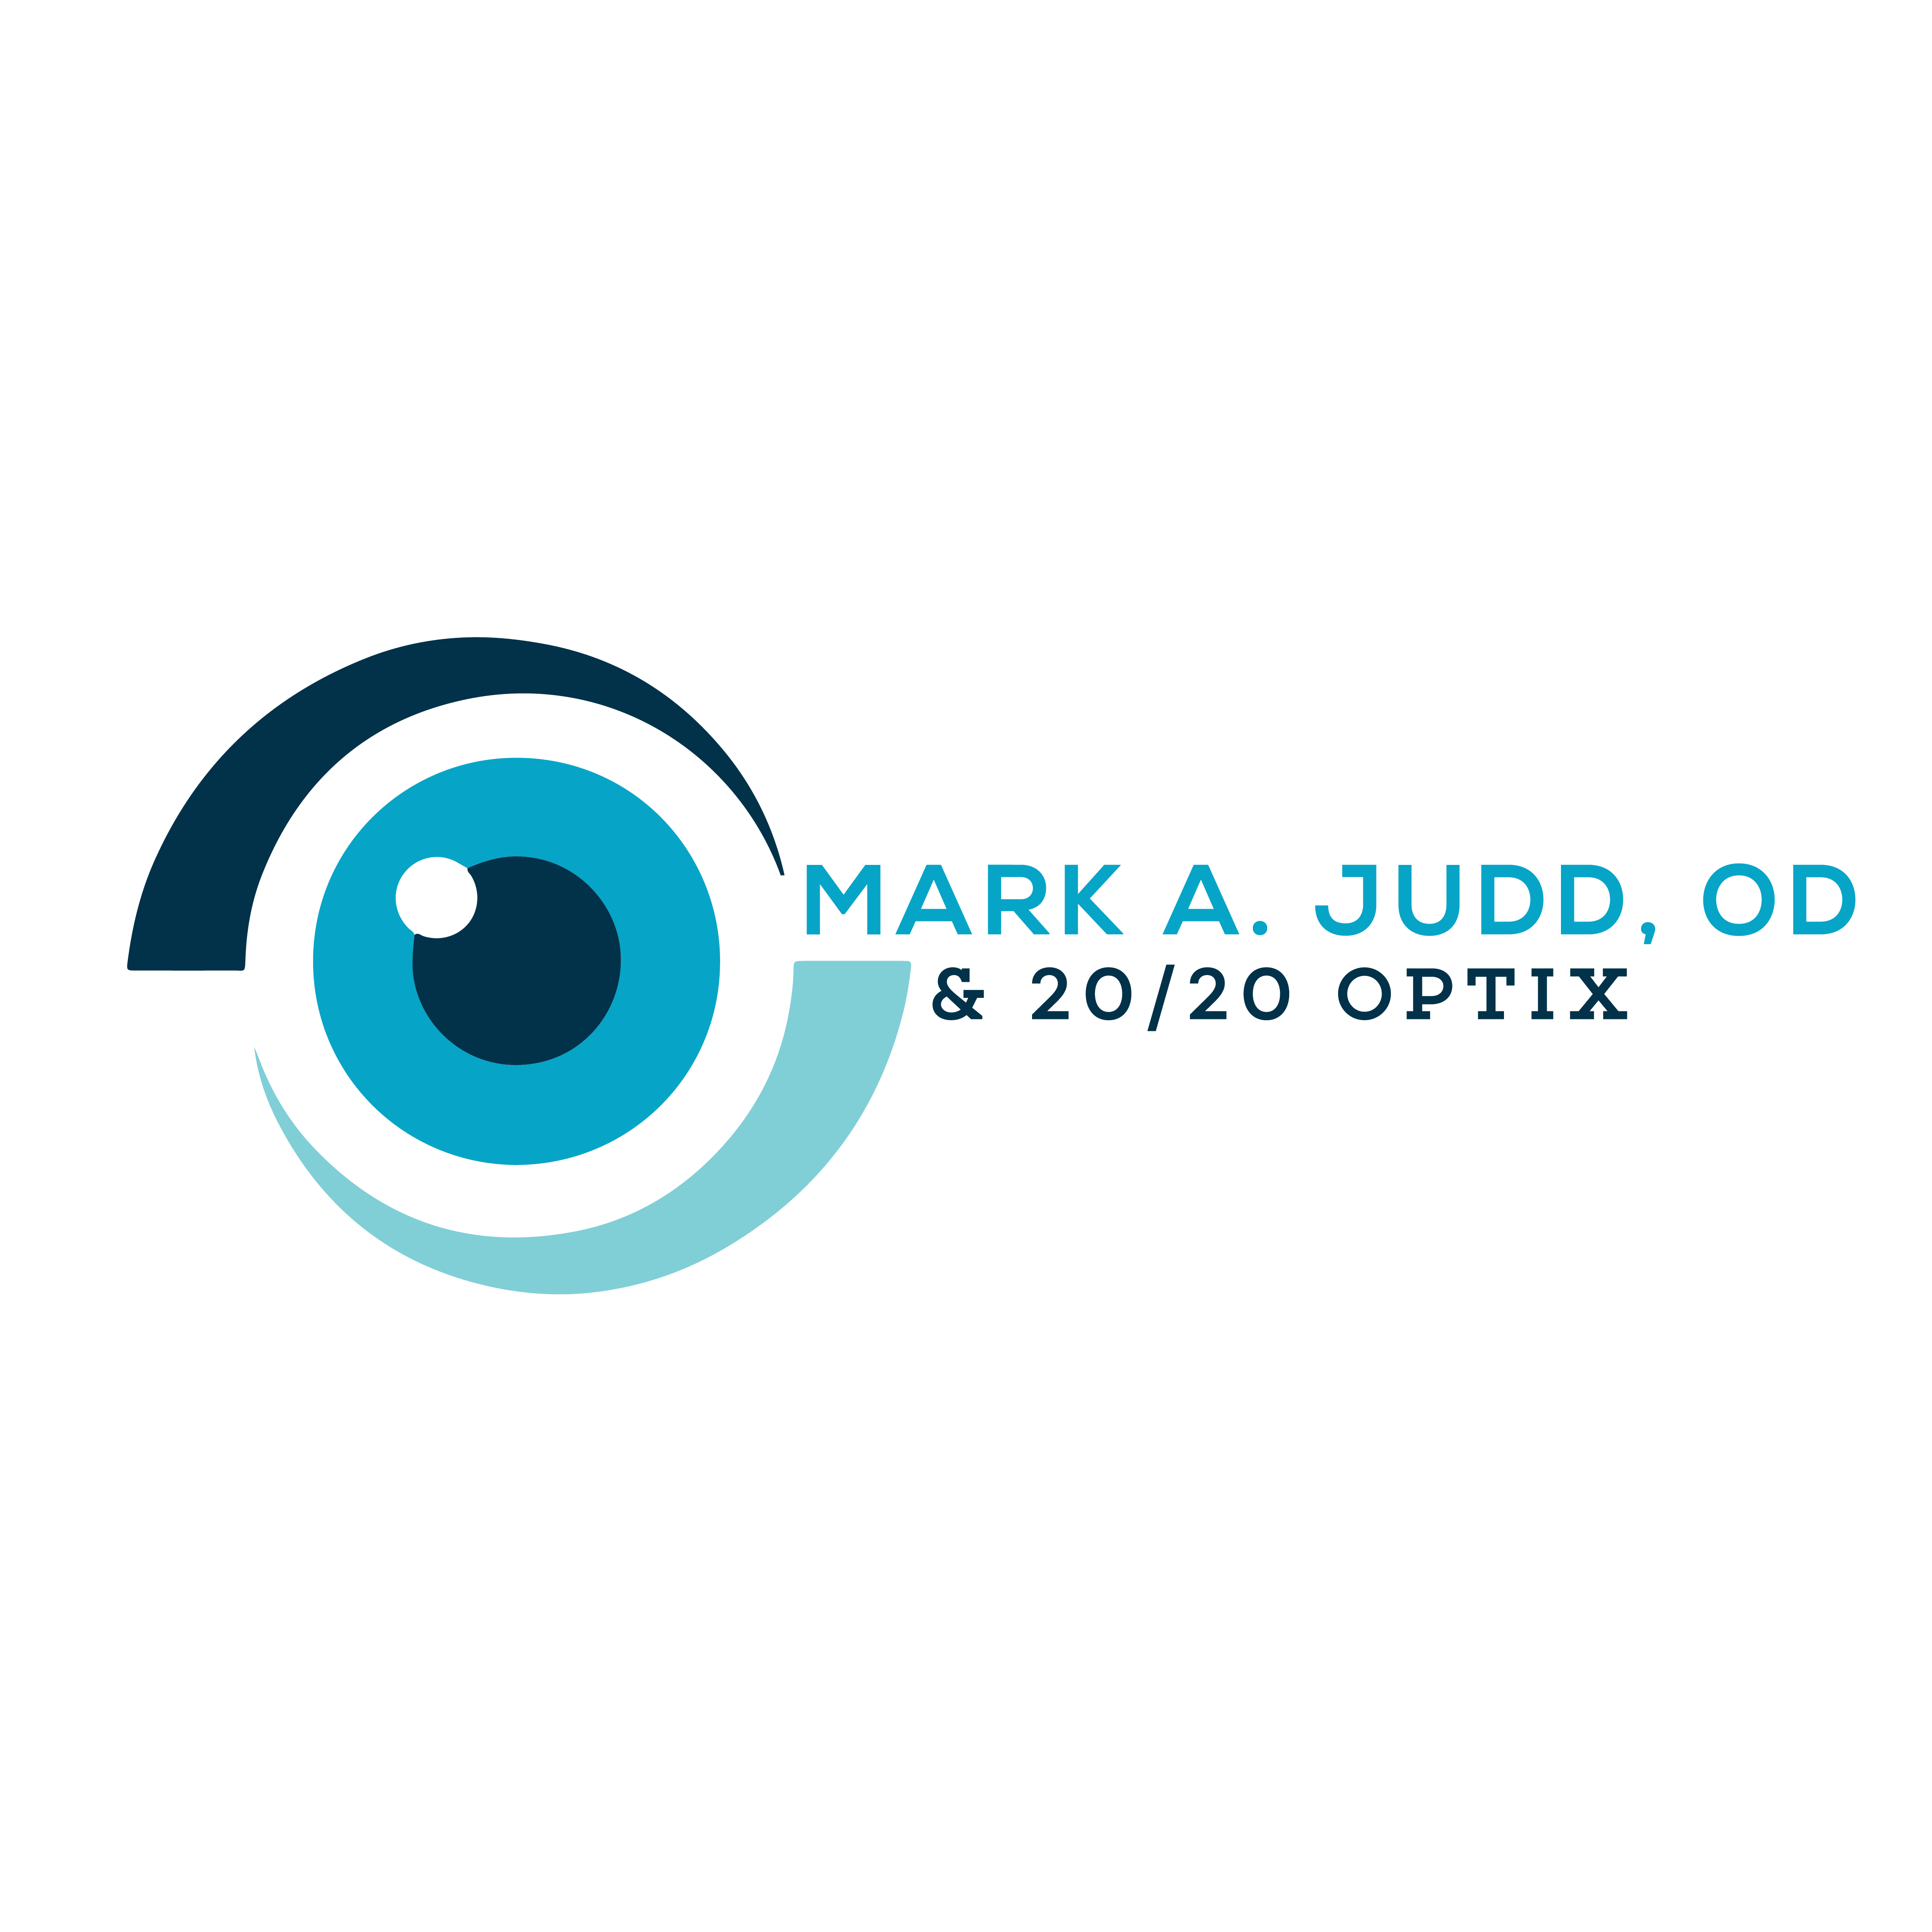 Mark A Judd, OD